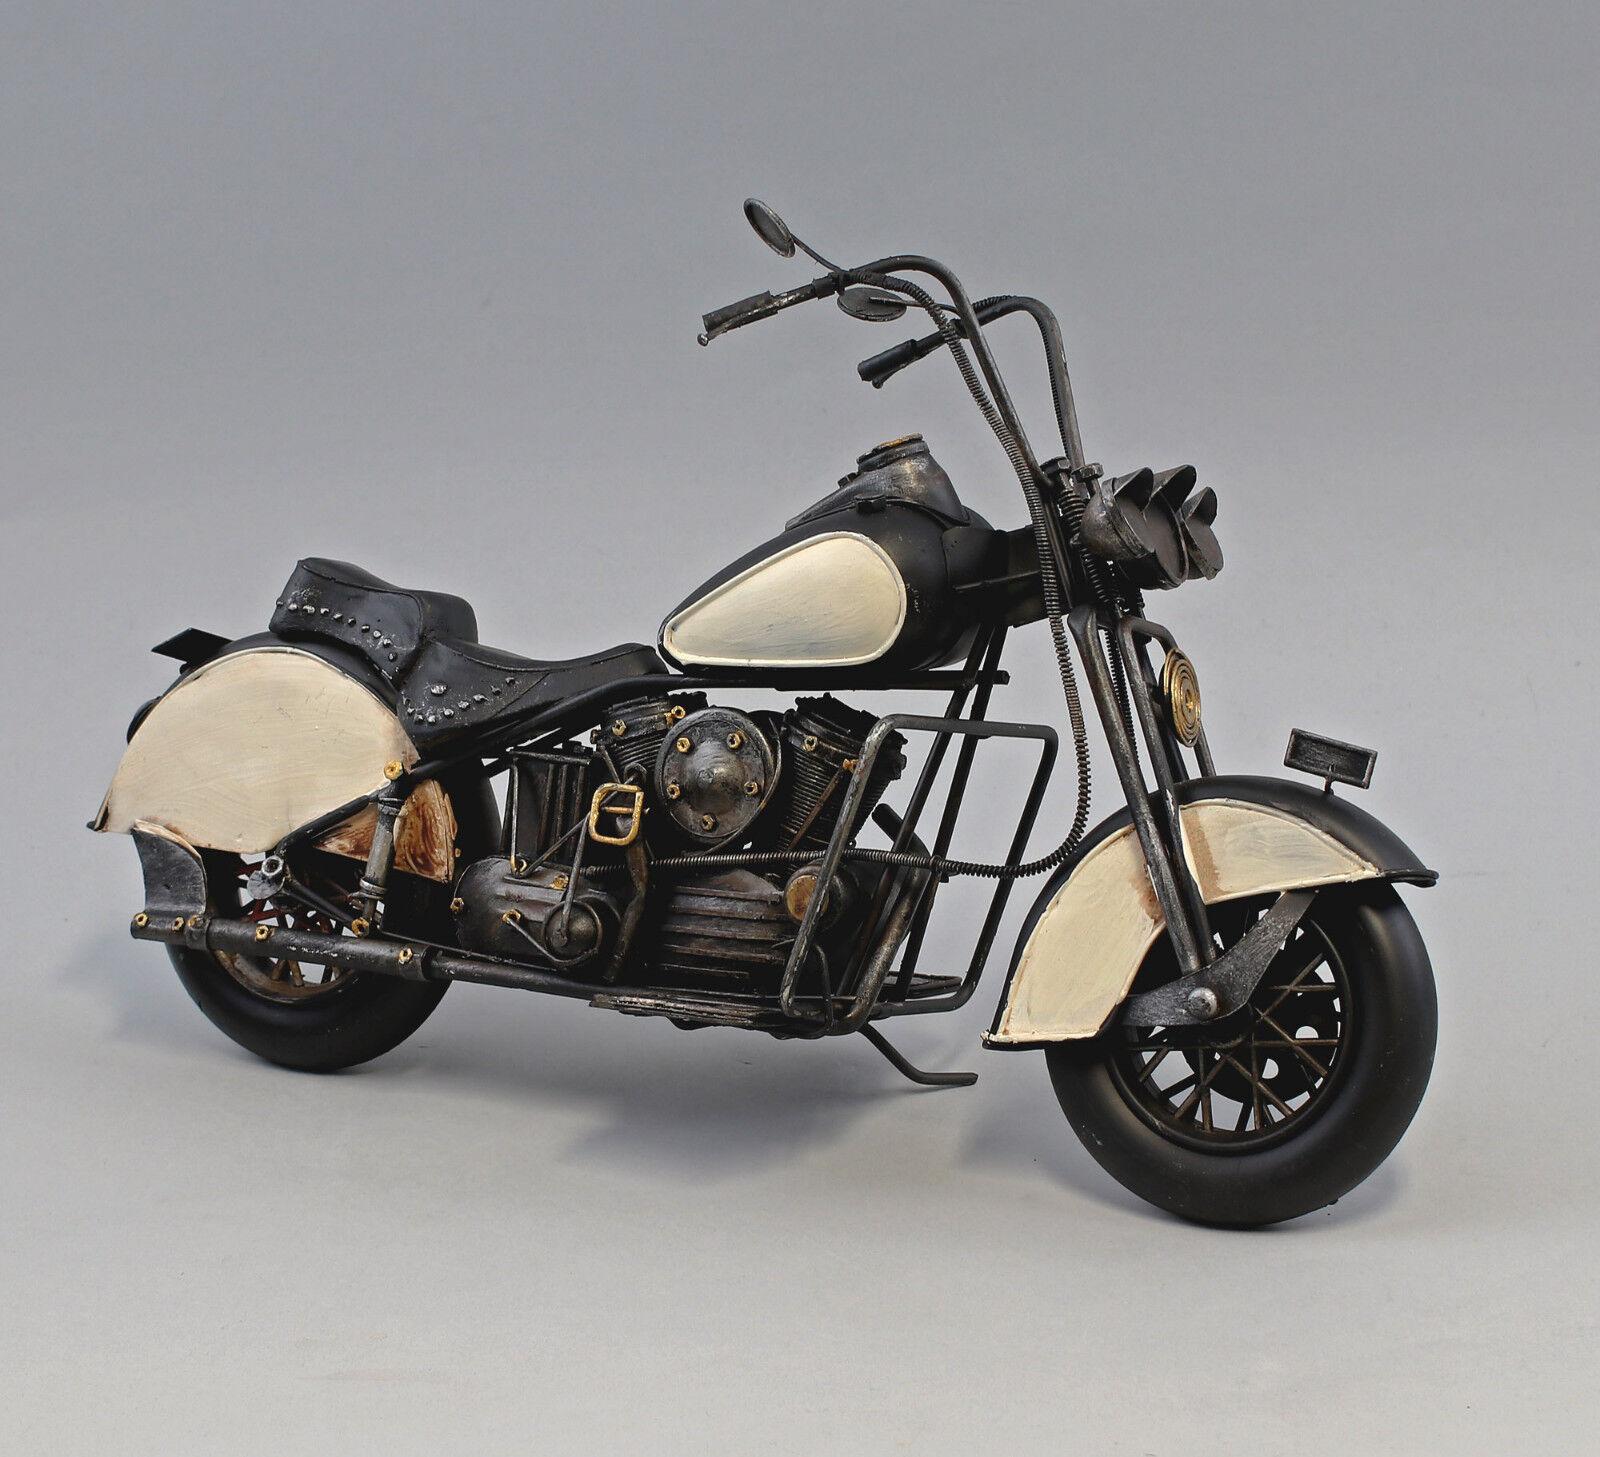 973028 Nostalgik Förlaga Bil Klassisk Bil Motorcycle 42x15x23cm